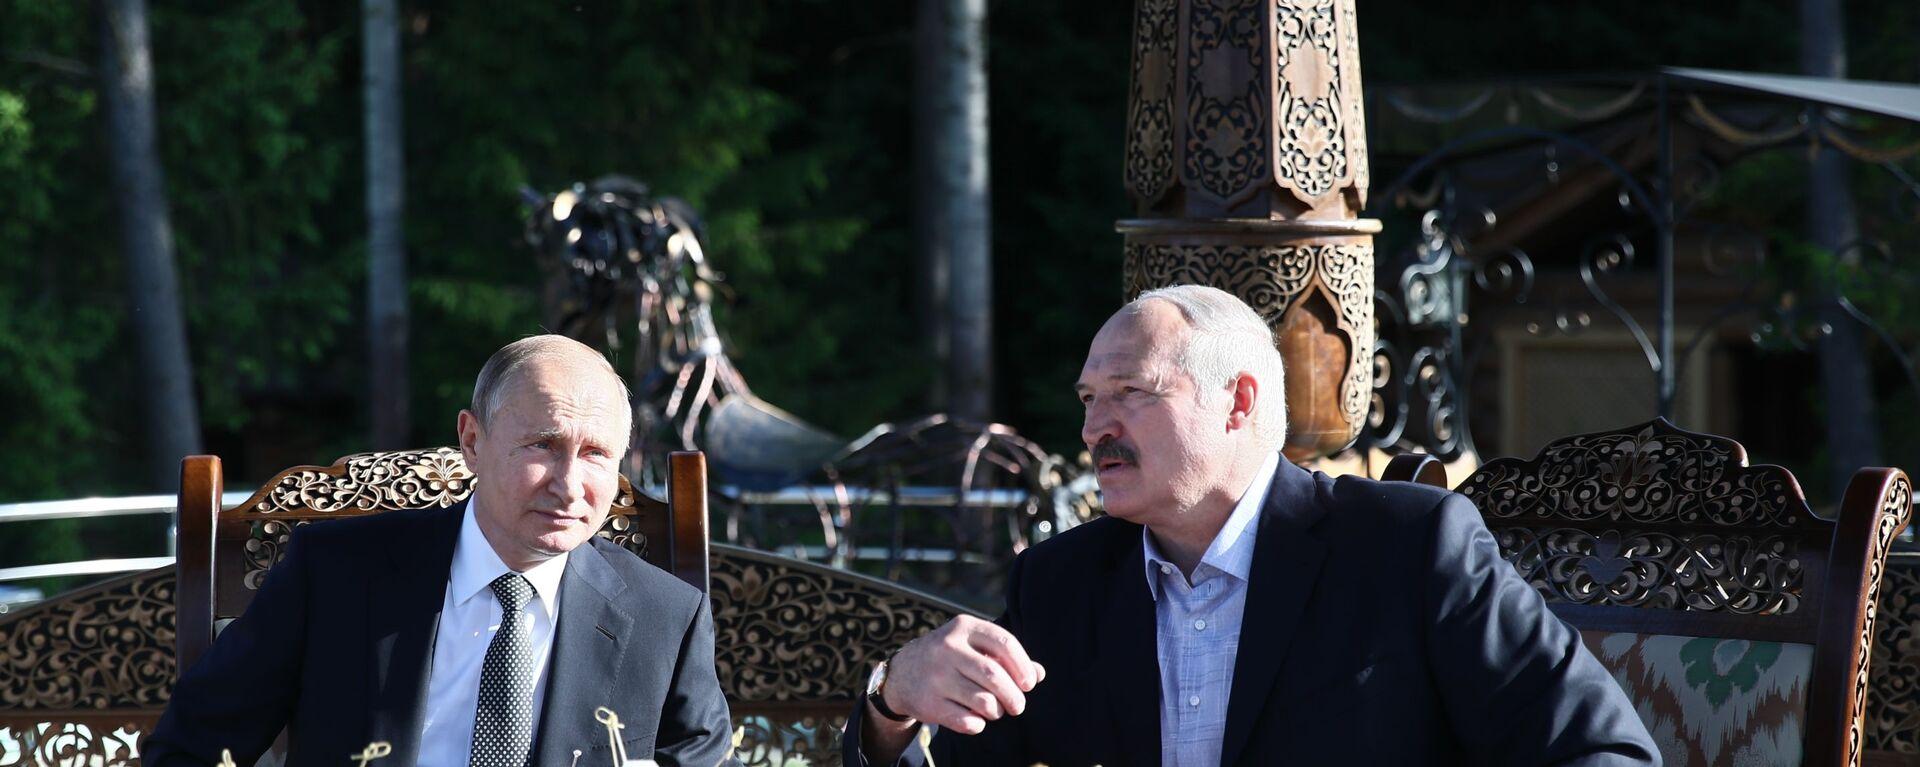 Рабочий визит президента РФ В. Путина в Республику Беларусь - Sputnik Таджикистан, 1920, 13.09.2020